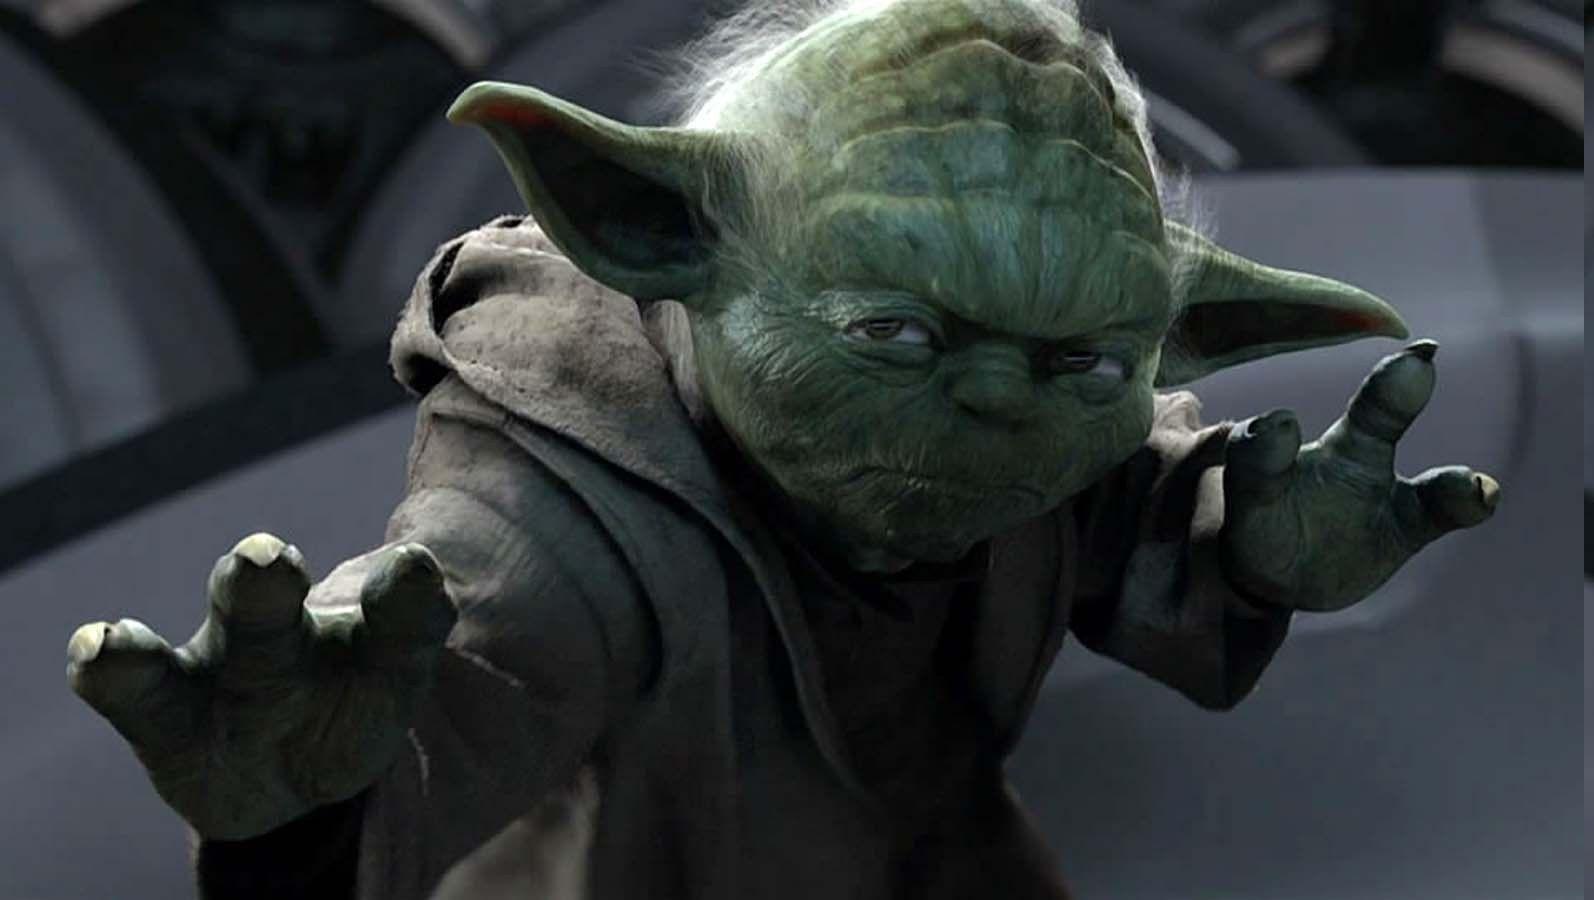 Star Wars Yoda Wallpapers Hd Desktop And Mobile Backgrounds Yoda Wallpaper Yoda Star Wars Yoda